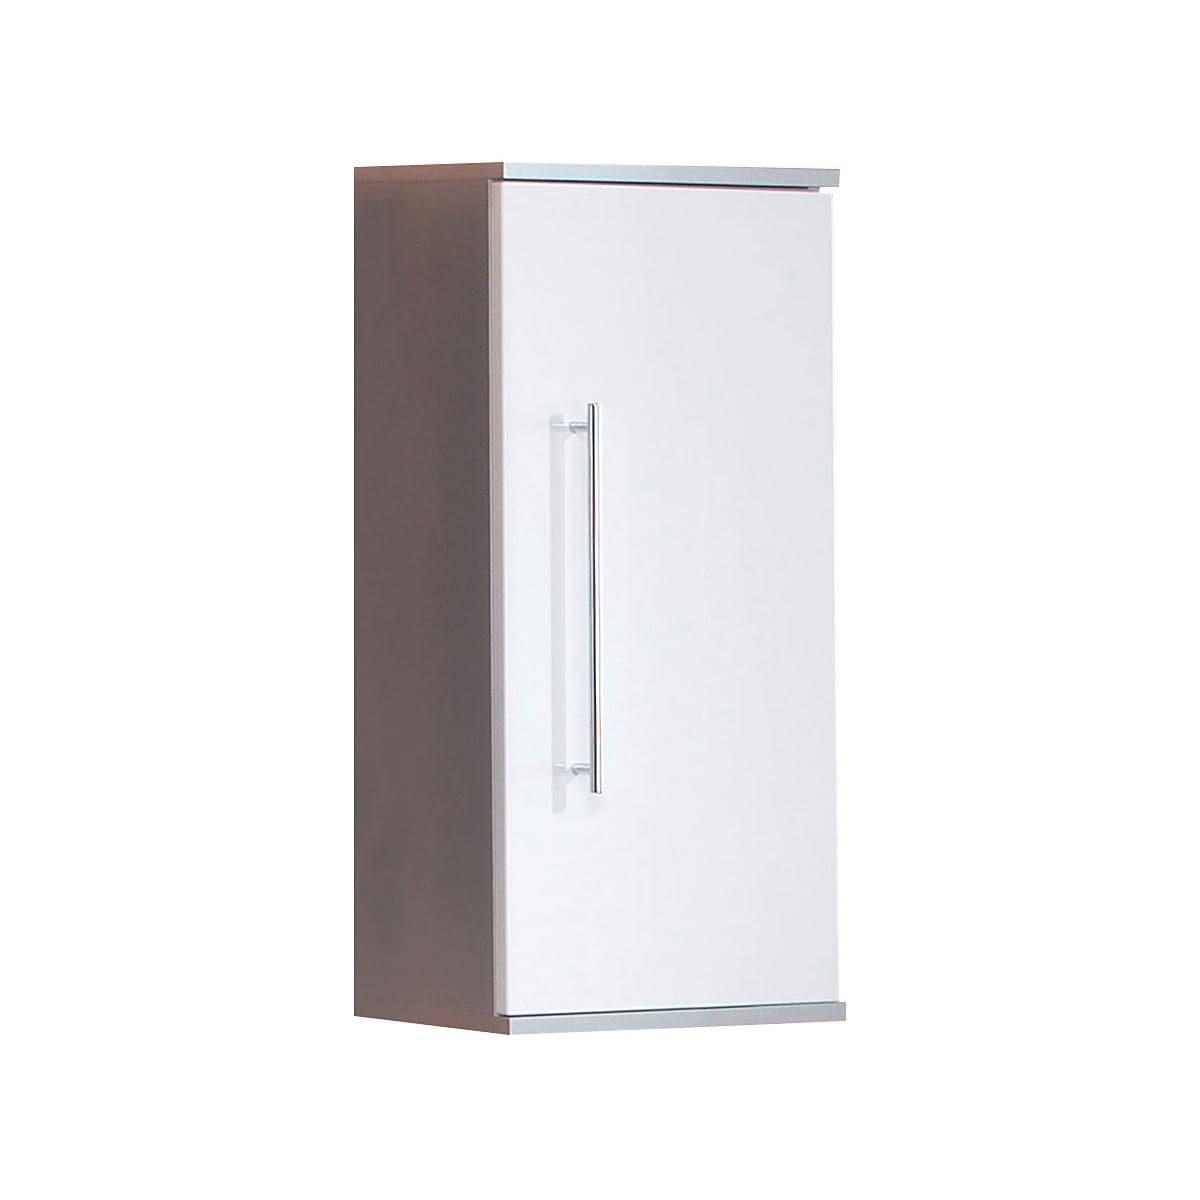 Oberschrank mdf wei hochglanz ca 32 5 x 73 5 x 21 cm for Porta online shop